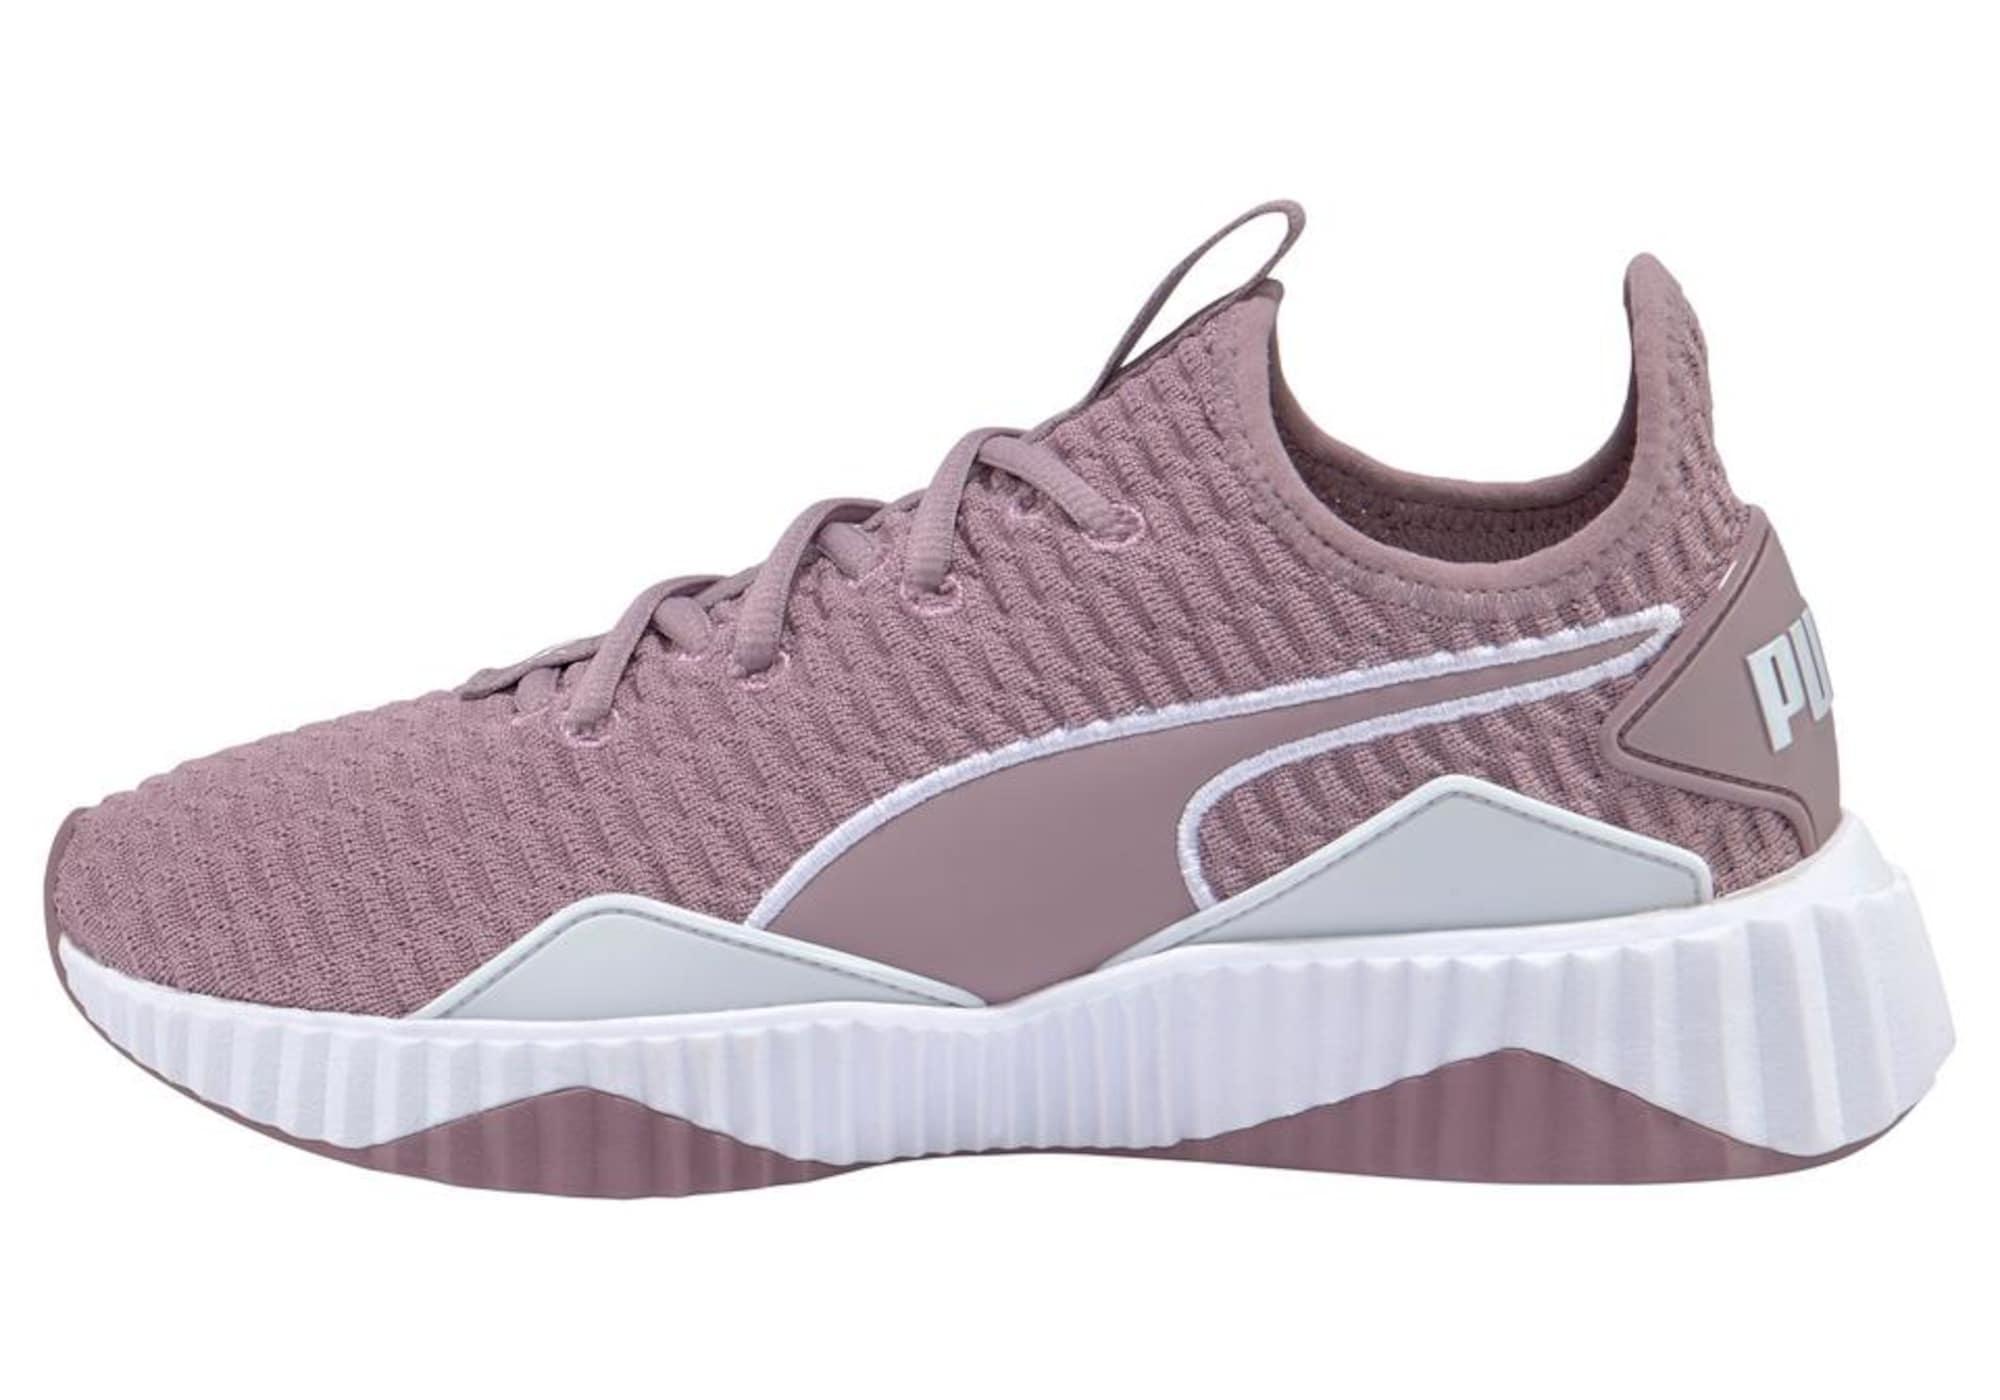 164abb7d8ea Puma schoenen online kopen | Fashionchick.nl